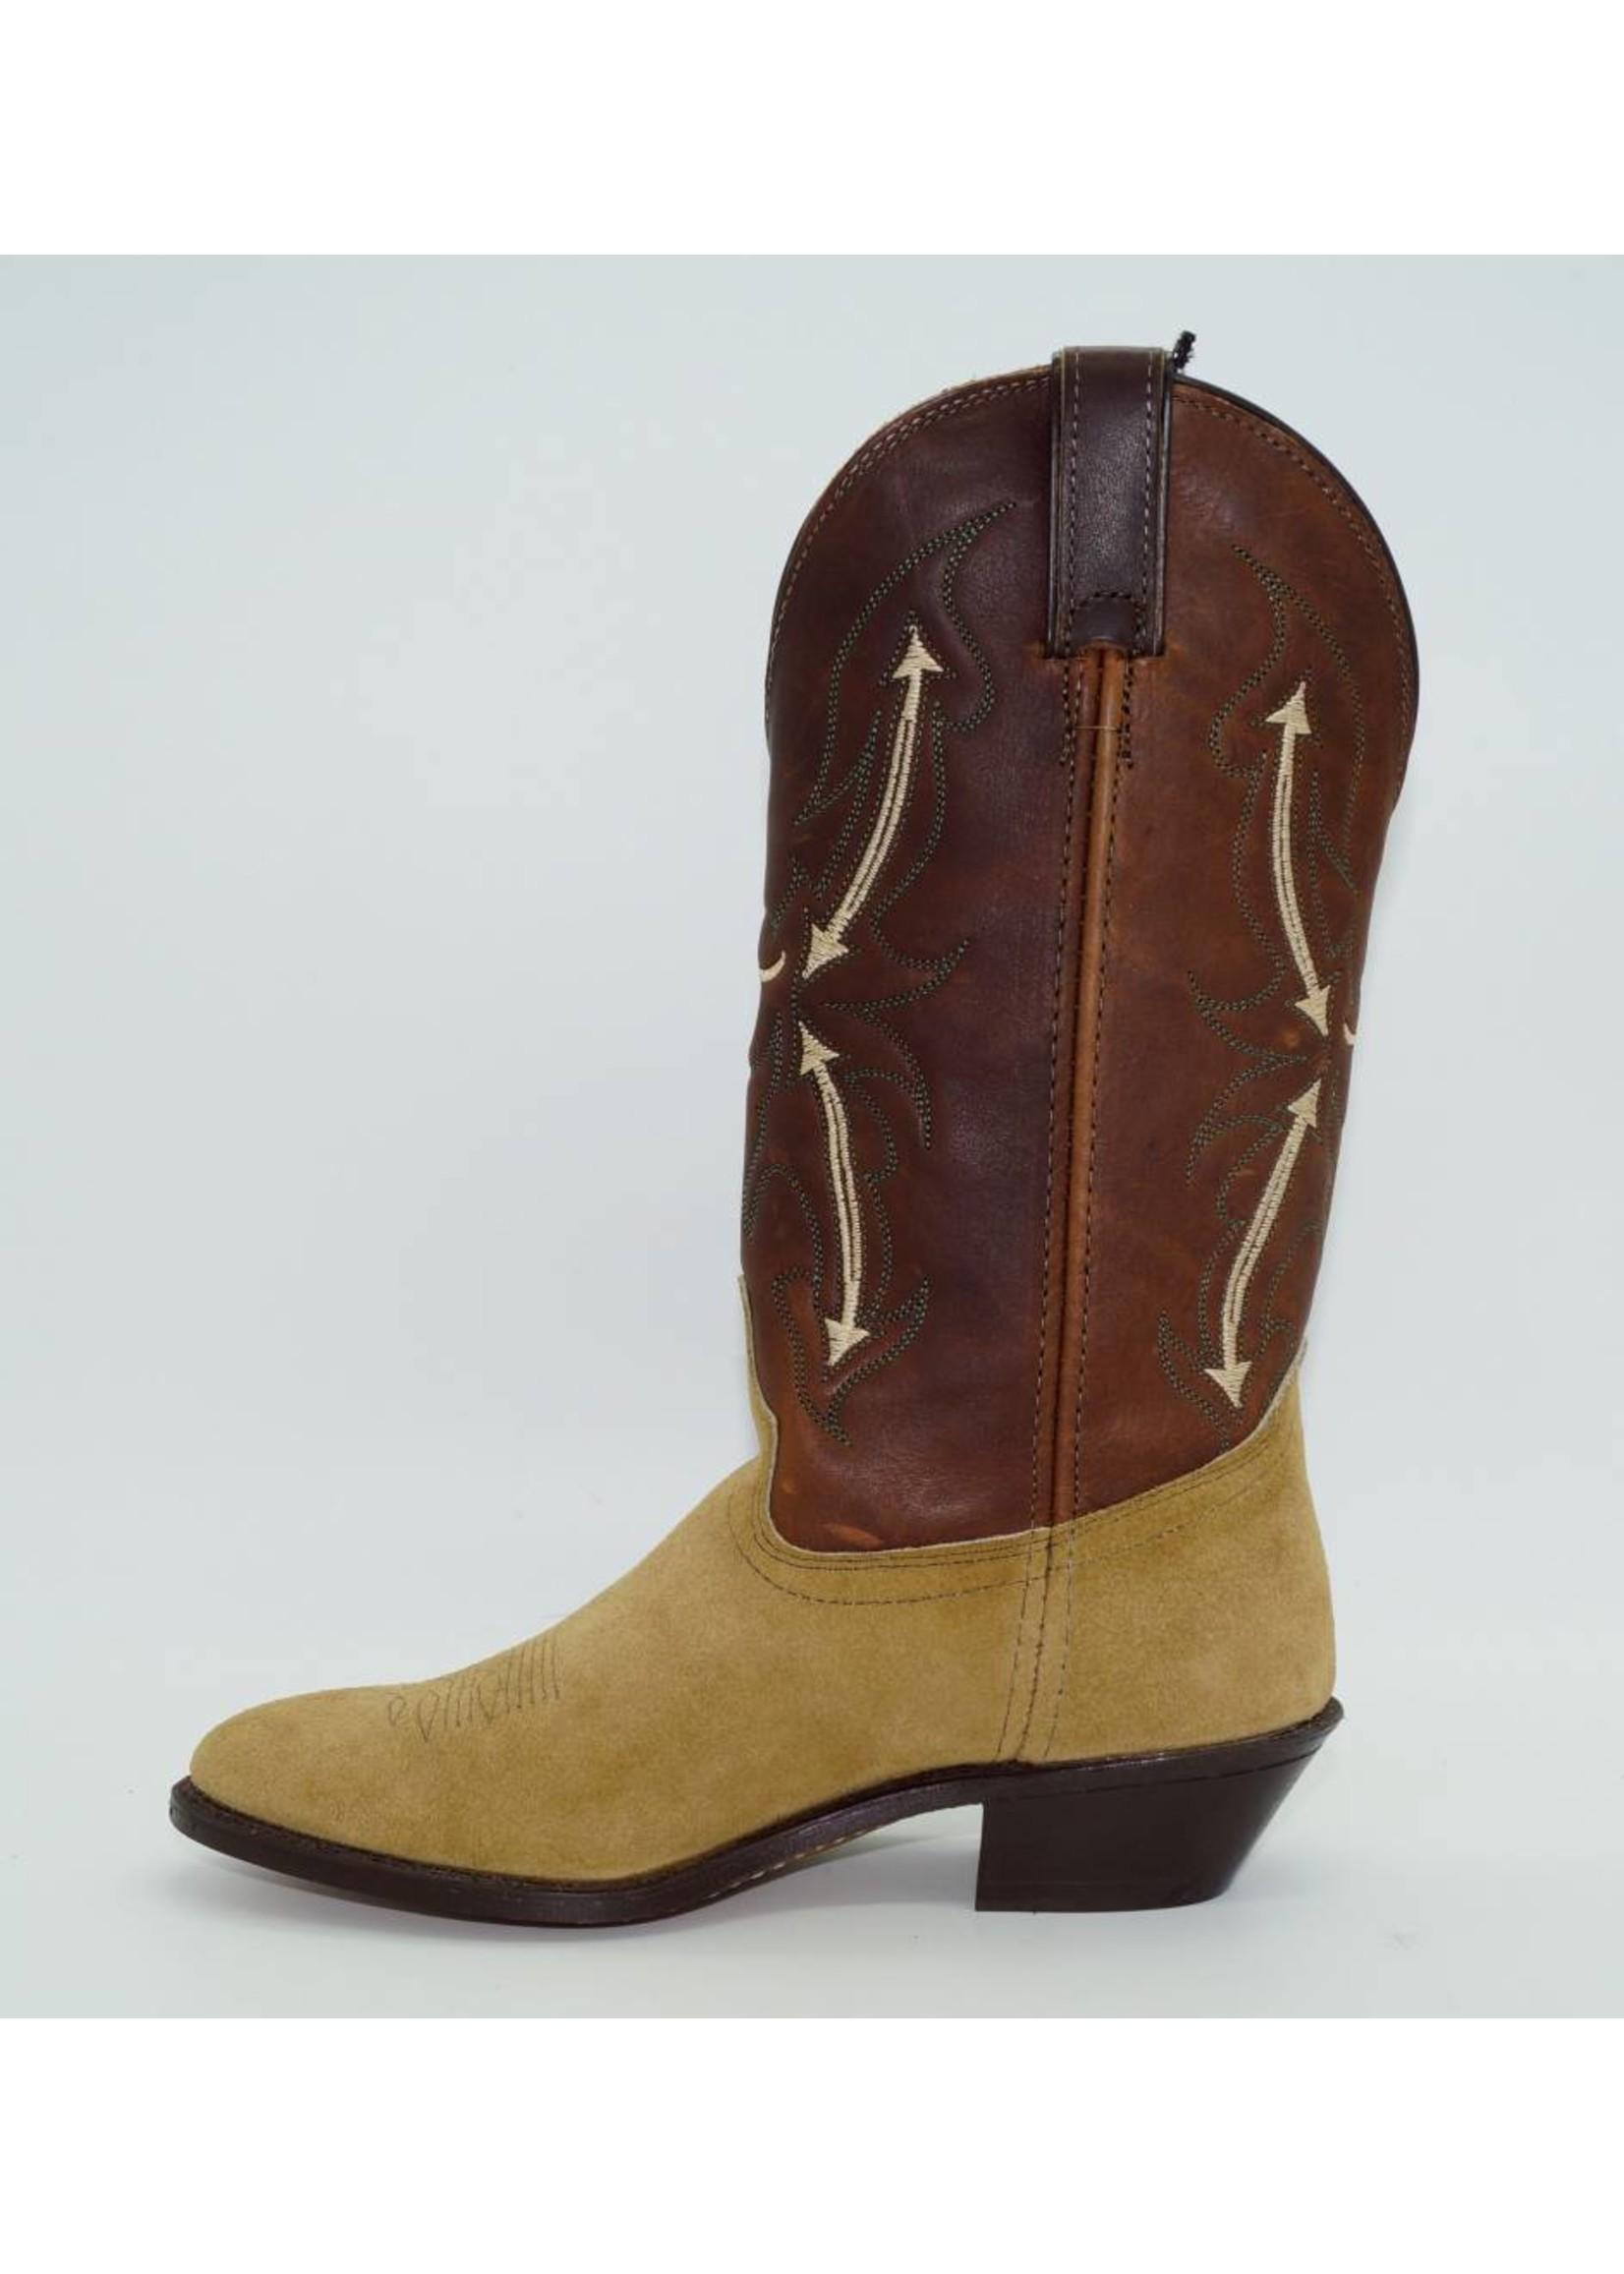 Laredo Women's  Brown Suede Boots 6022